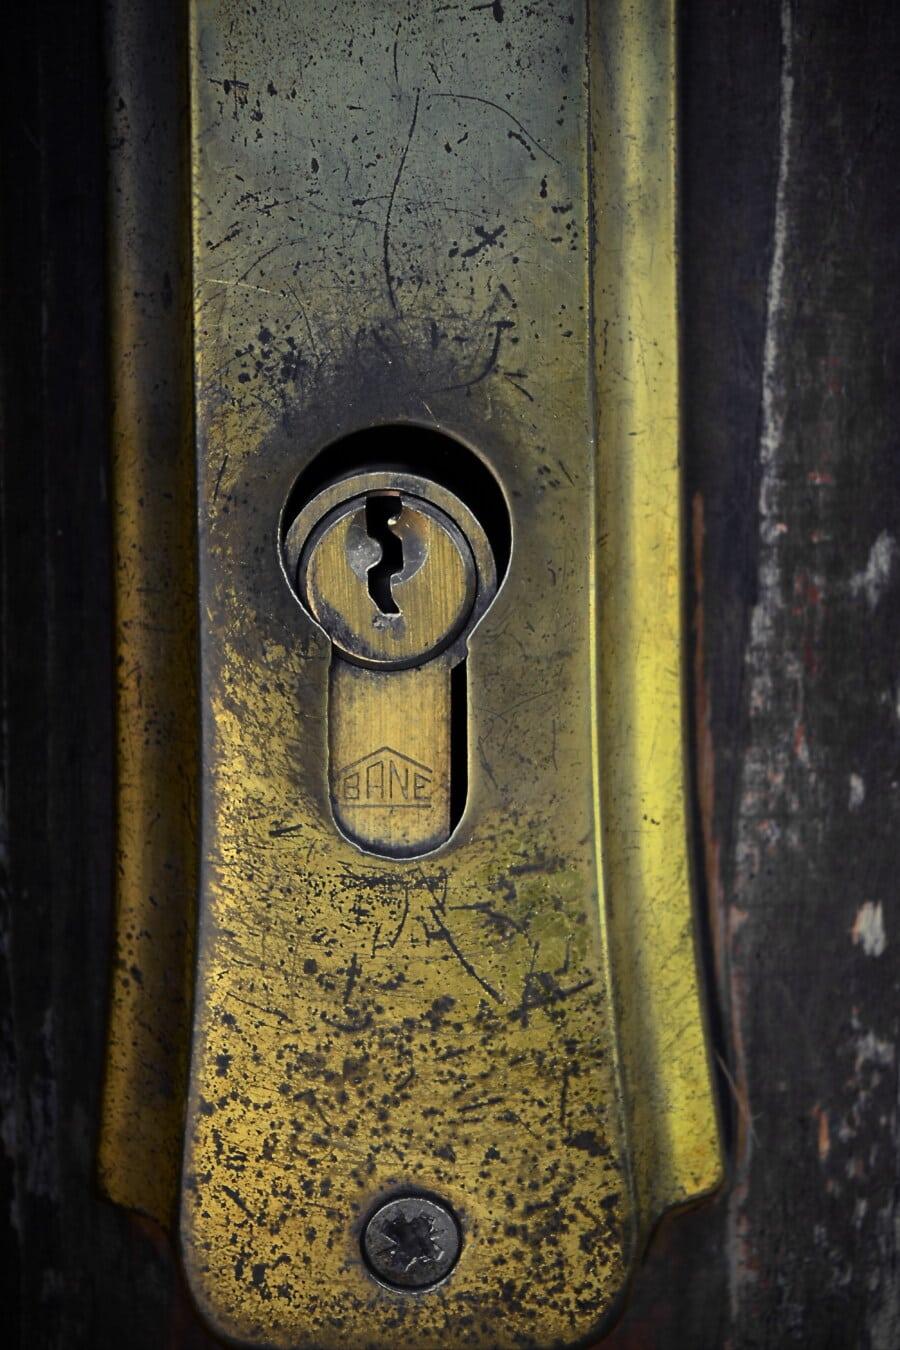 brass, keyhole, shining, metallic, glossy, golden shine, door, lock, old, security